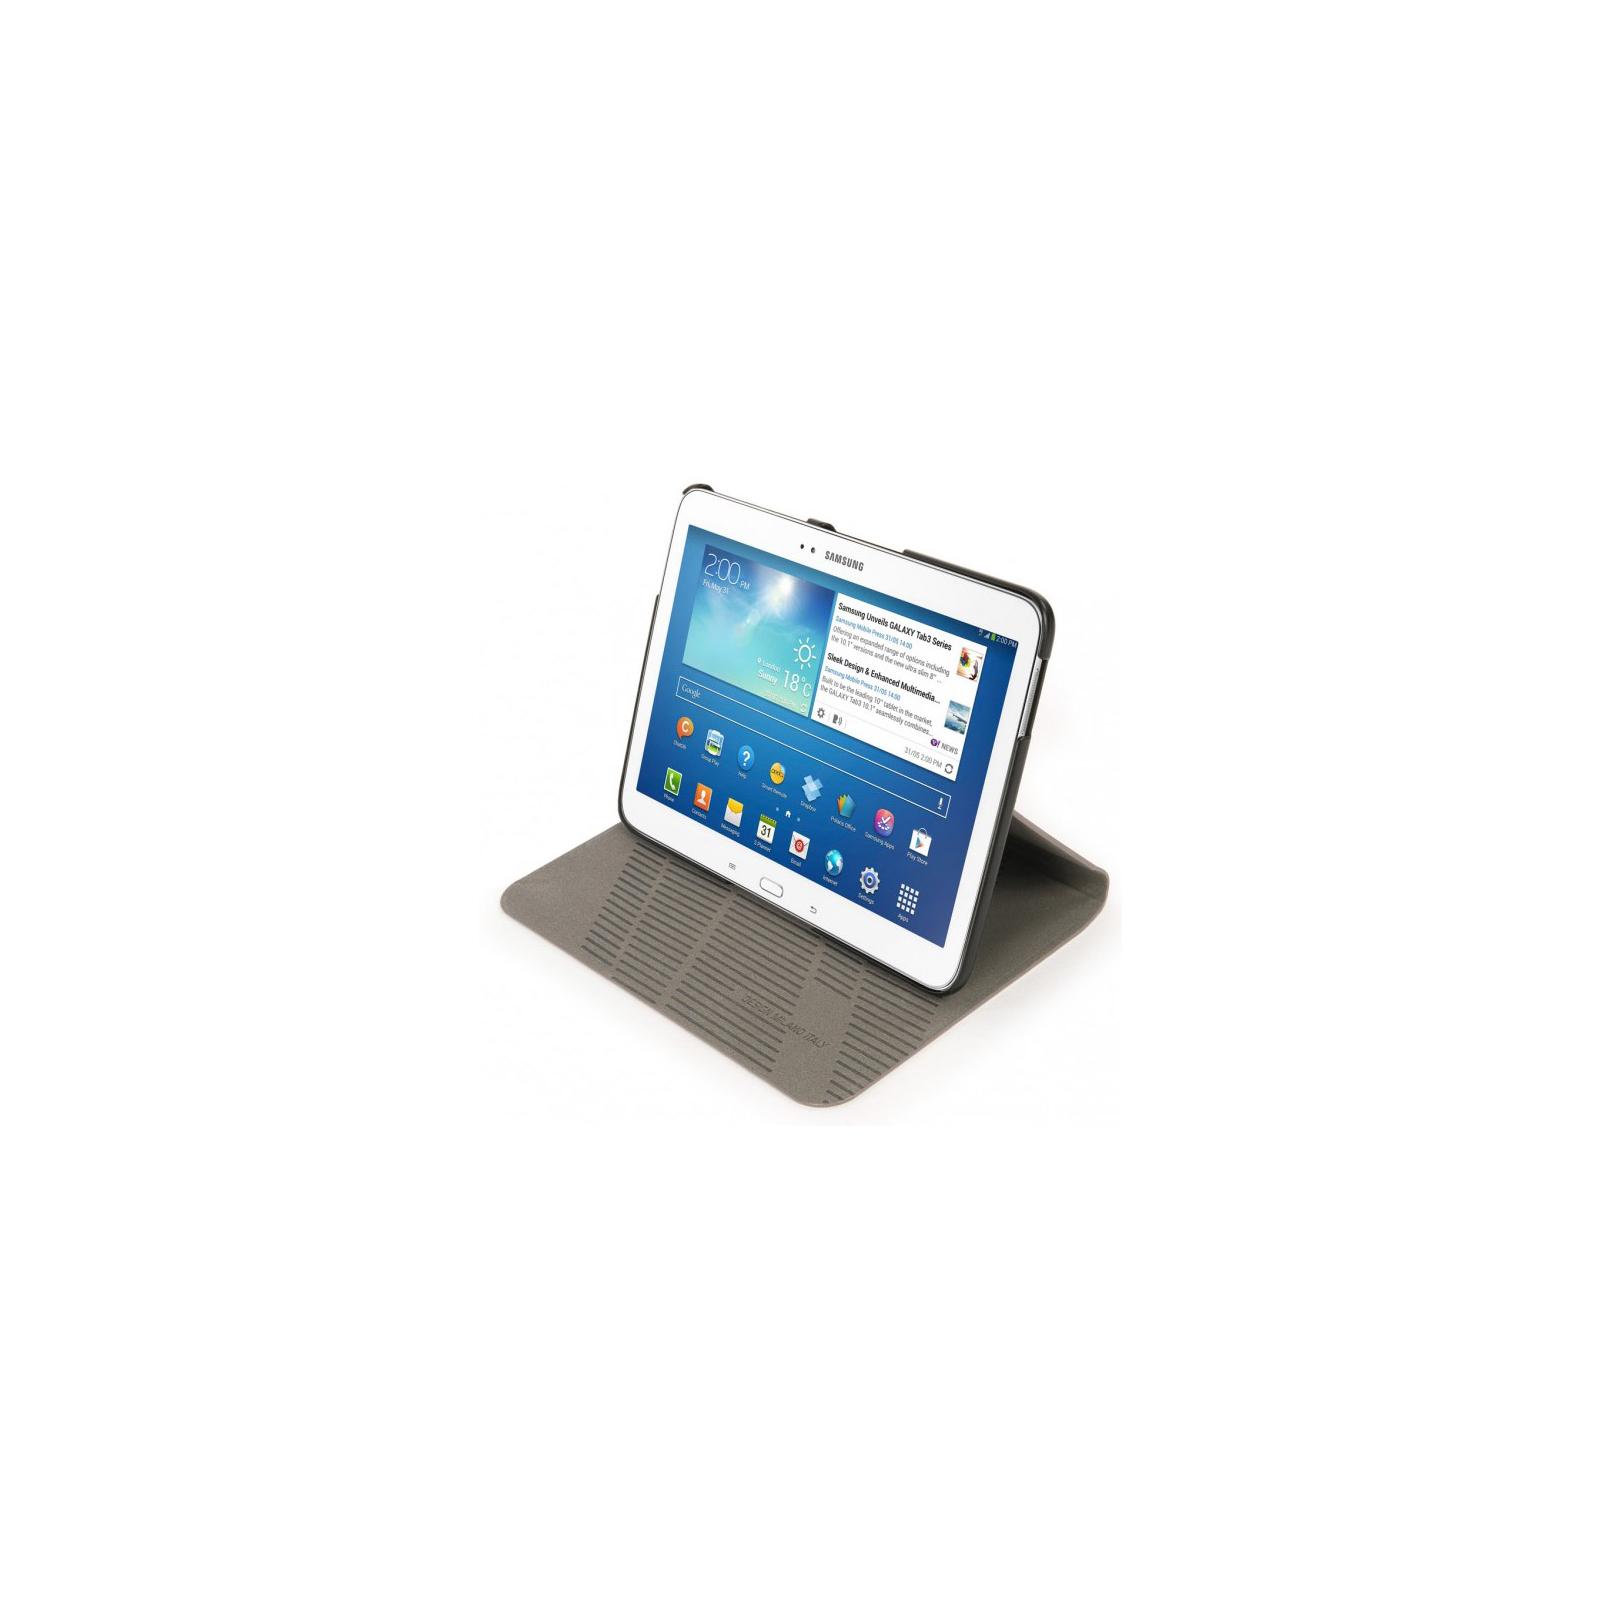 Чехол для планшета Tucano Galaxy Tab3 10.1 Macro (TAB-MS310-G) изображение 5